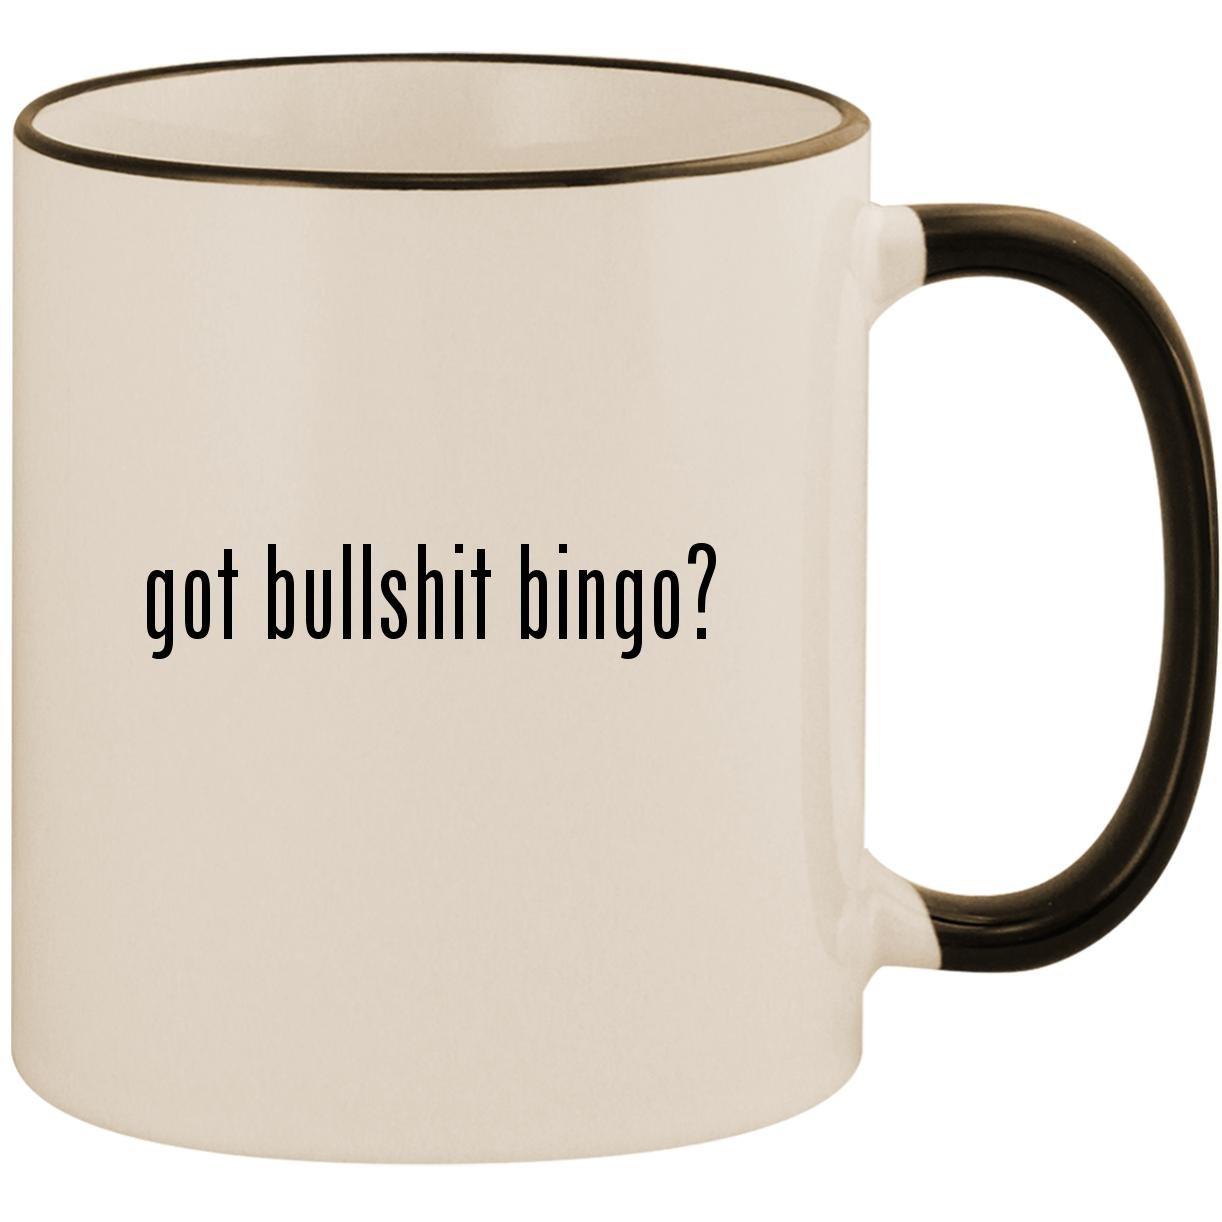 got bullshit bingo? - 11oz Ceramic Colored Handle & Rim Coffee Mug Cup, Black by Molandra Products